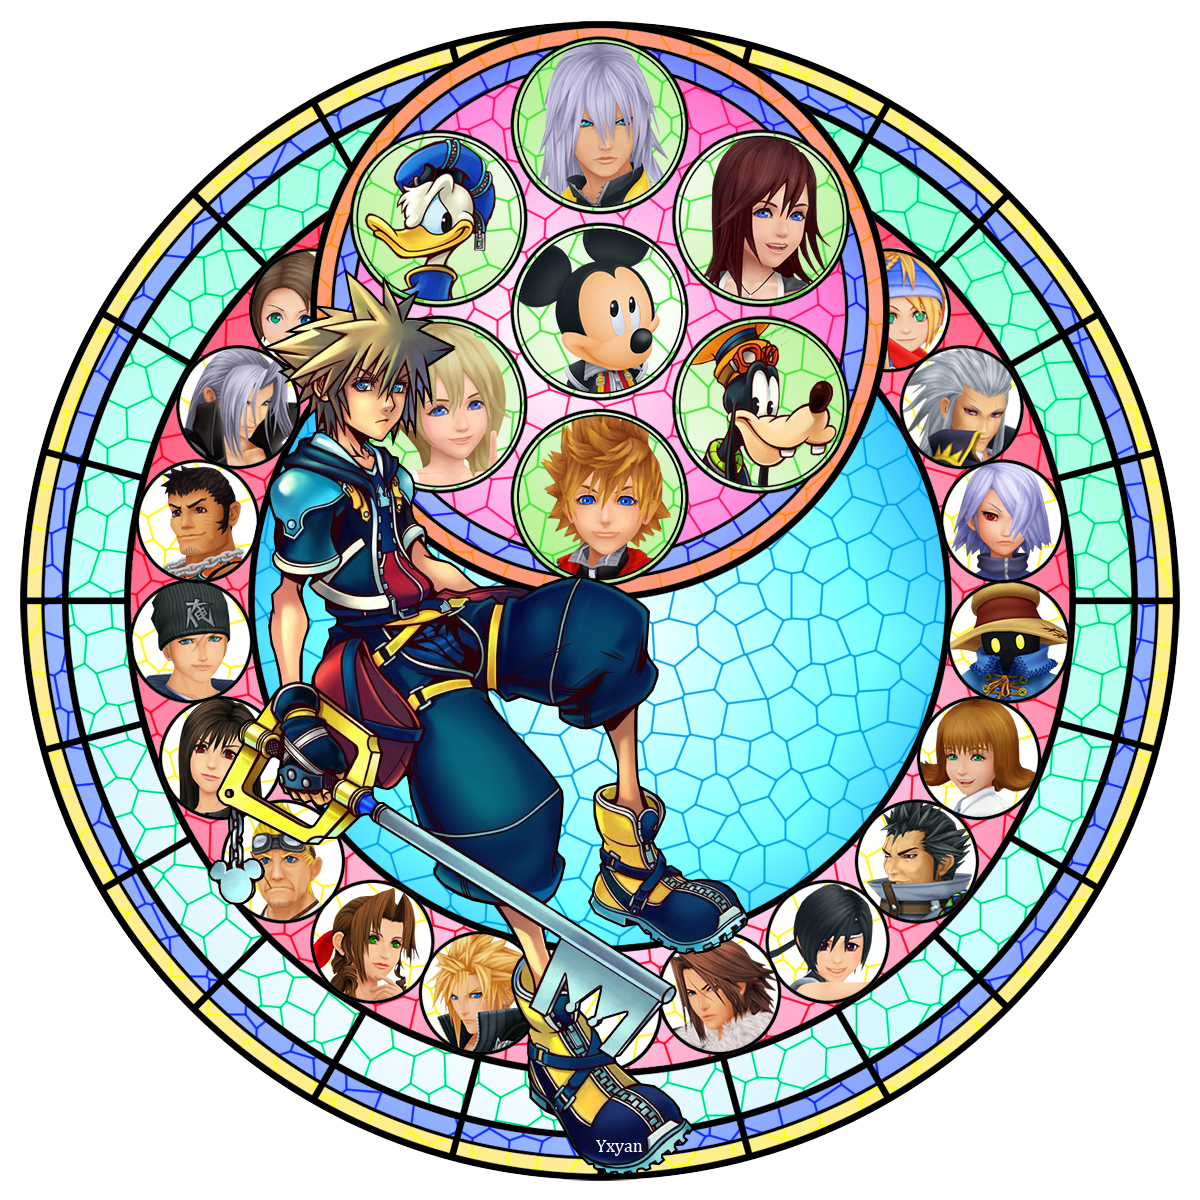 Sora Kingdom Hearts Kingdom Hearts: Kingdom Hearts, Kingdom Hearts Ii